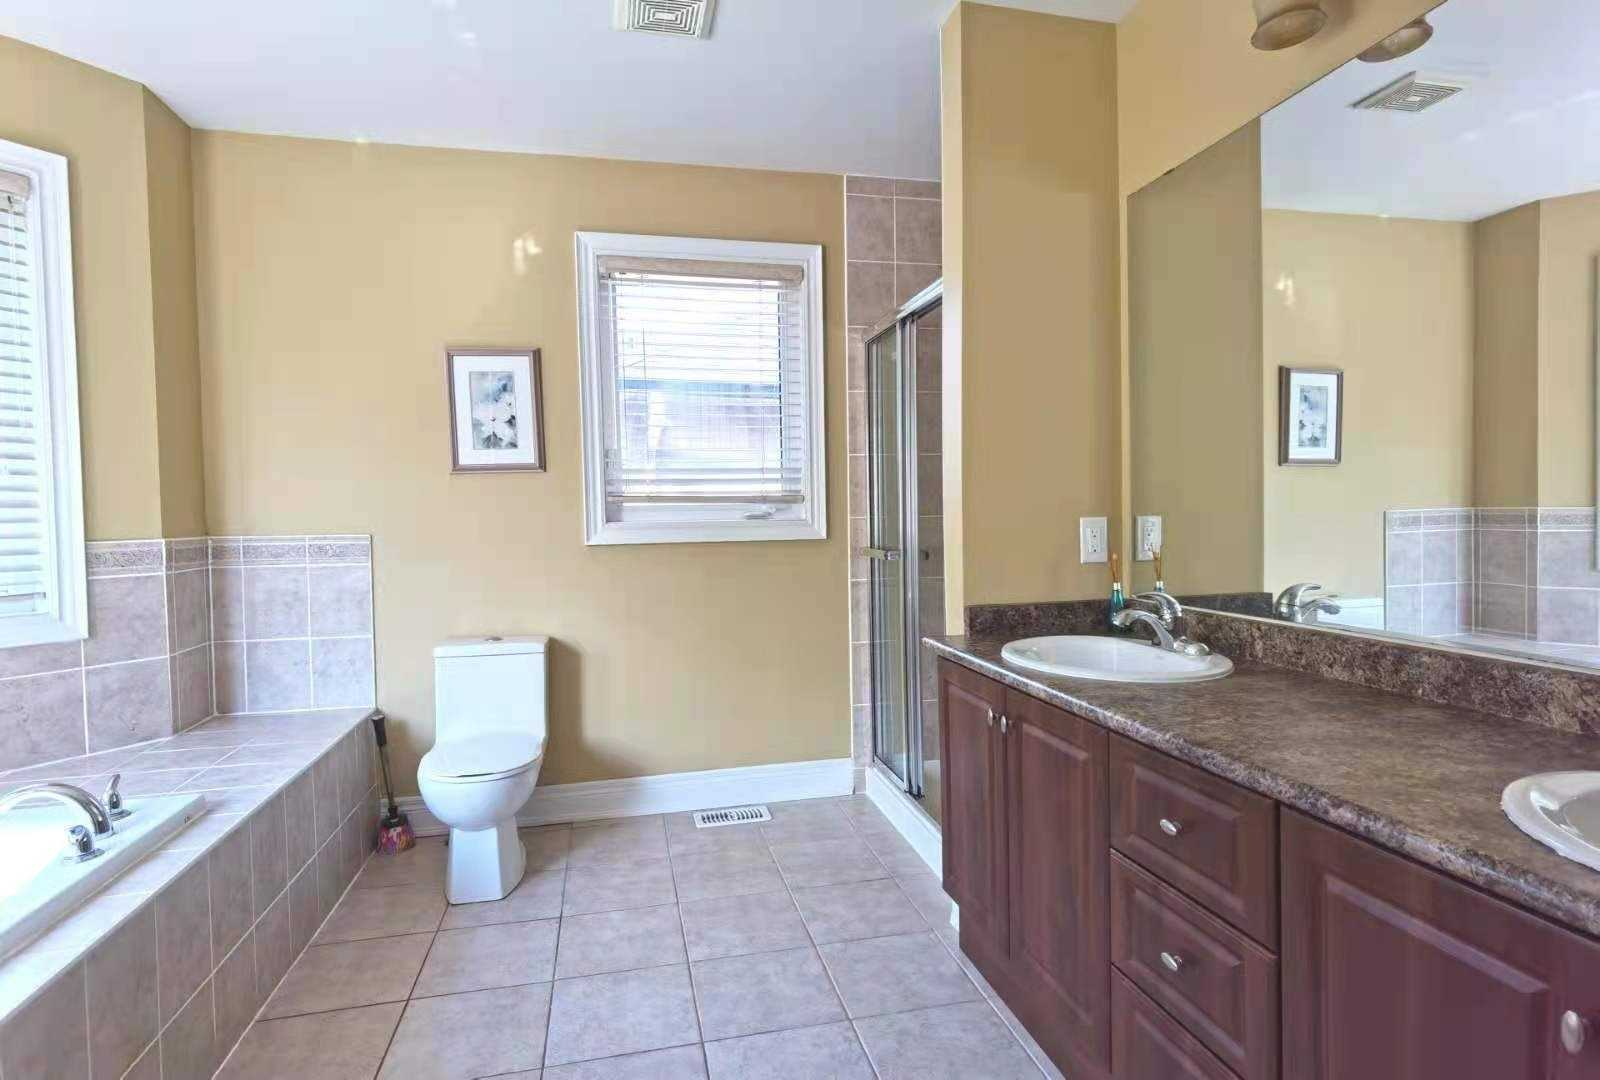 Detached house For Lease In Oakville - 2241 Adirondak Tr, Oakville, Ontario, Canada L6M4W4 , 5 Bedrooms Bedrooms, ,5 BathroomsBathrooms,Detached,For Lease,Adirondak